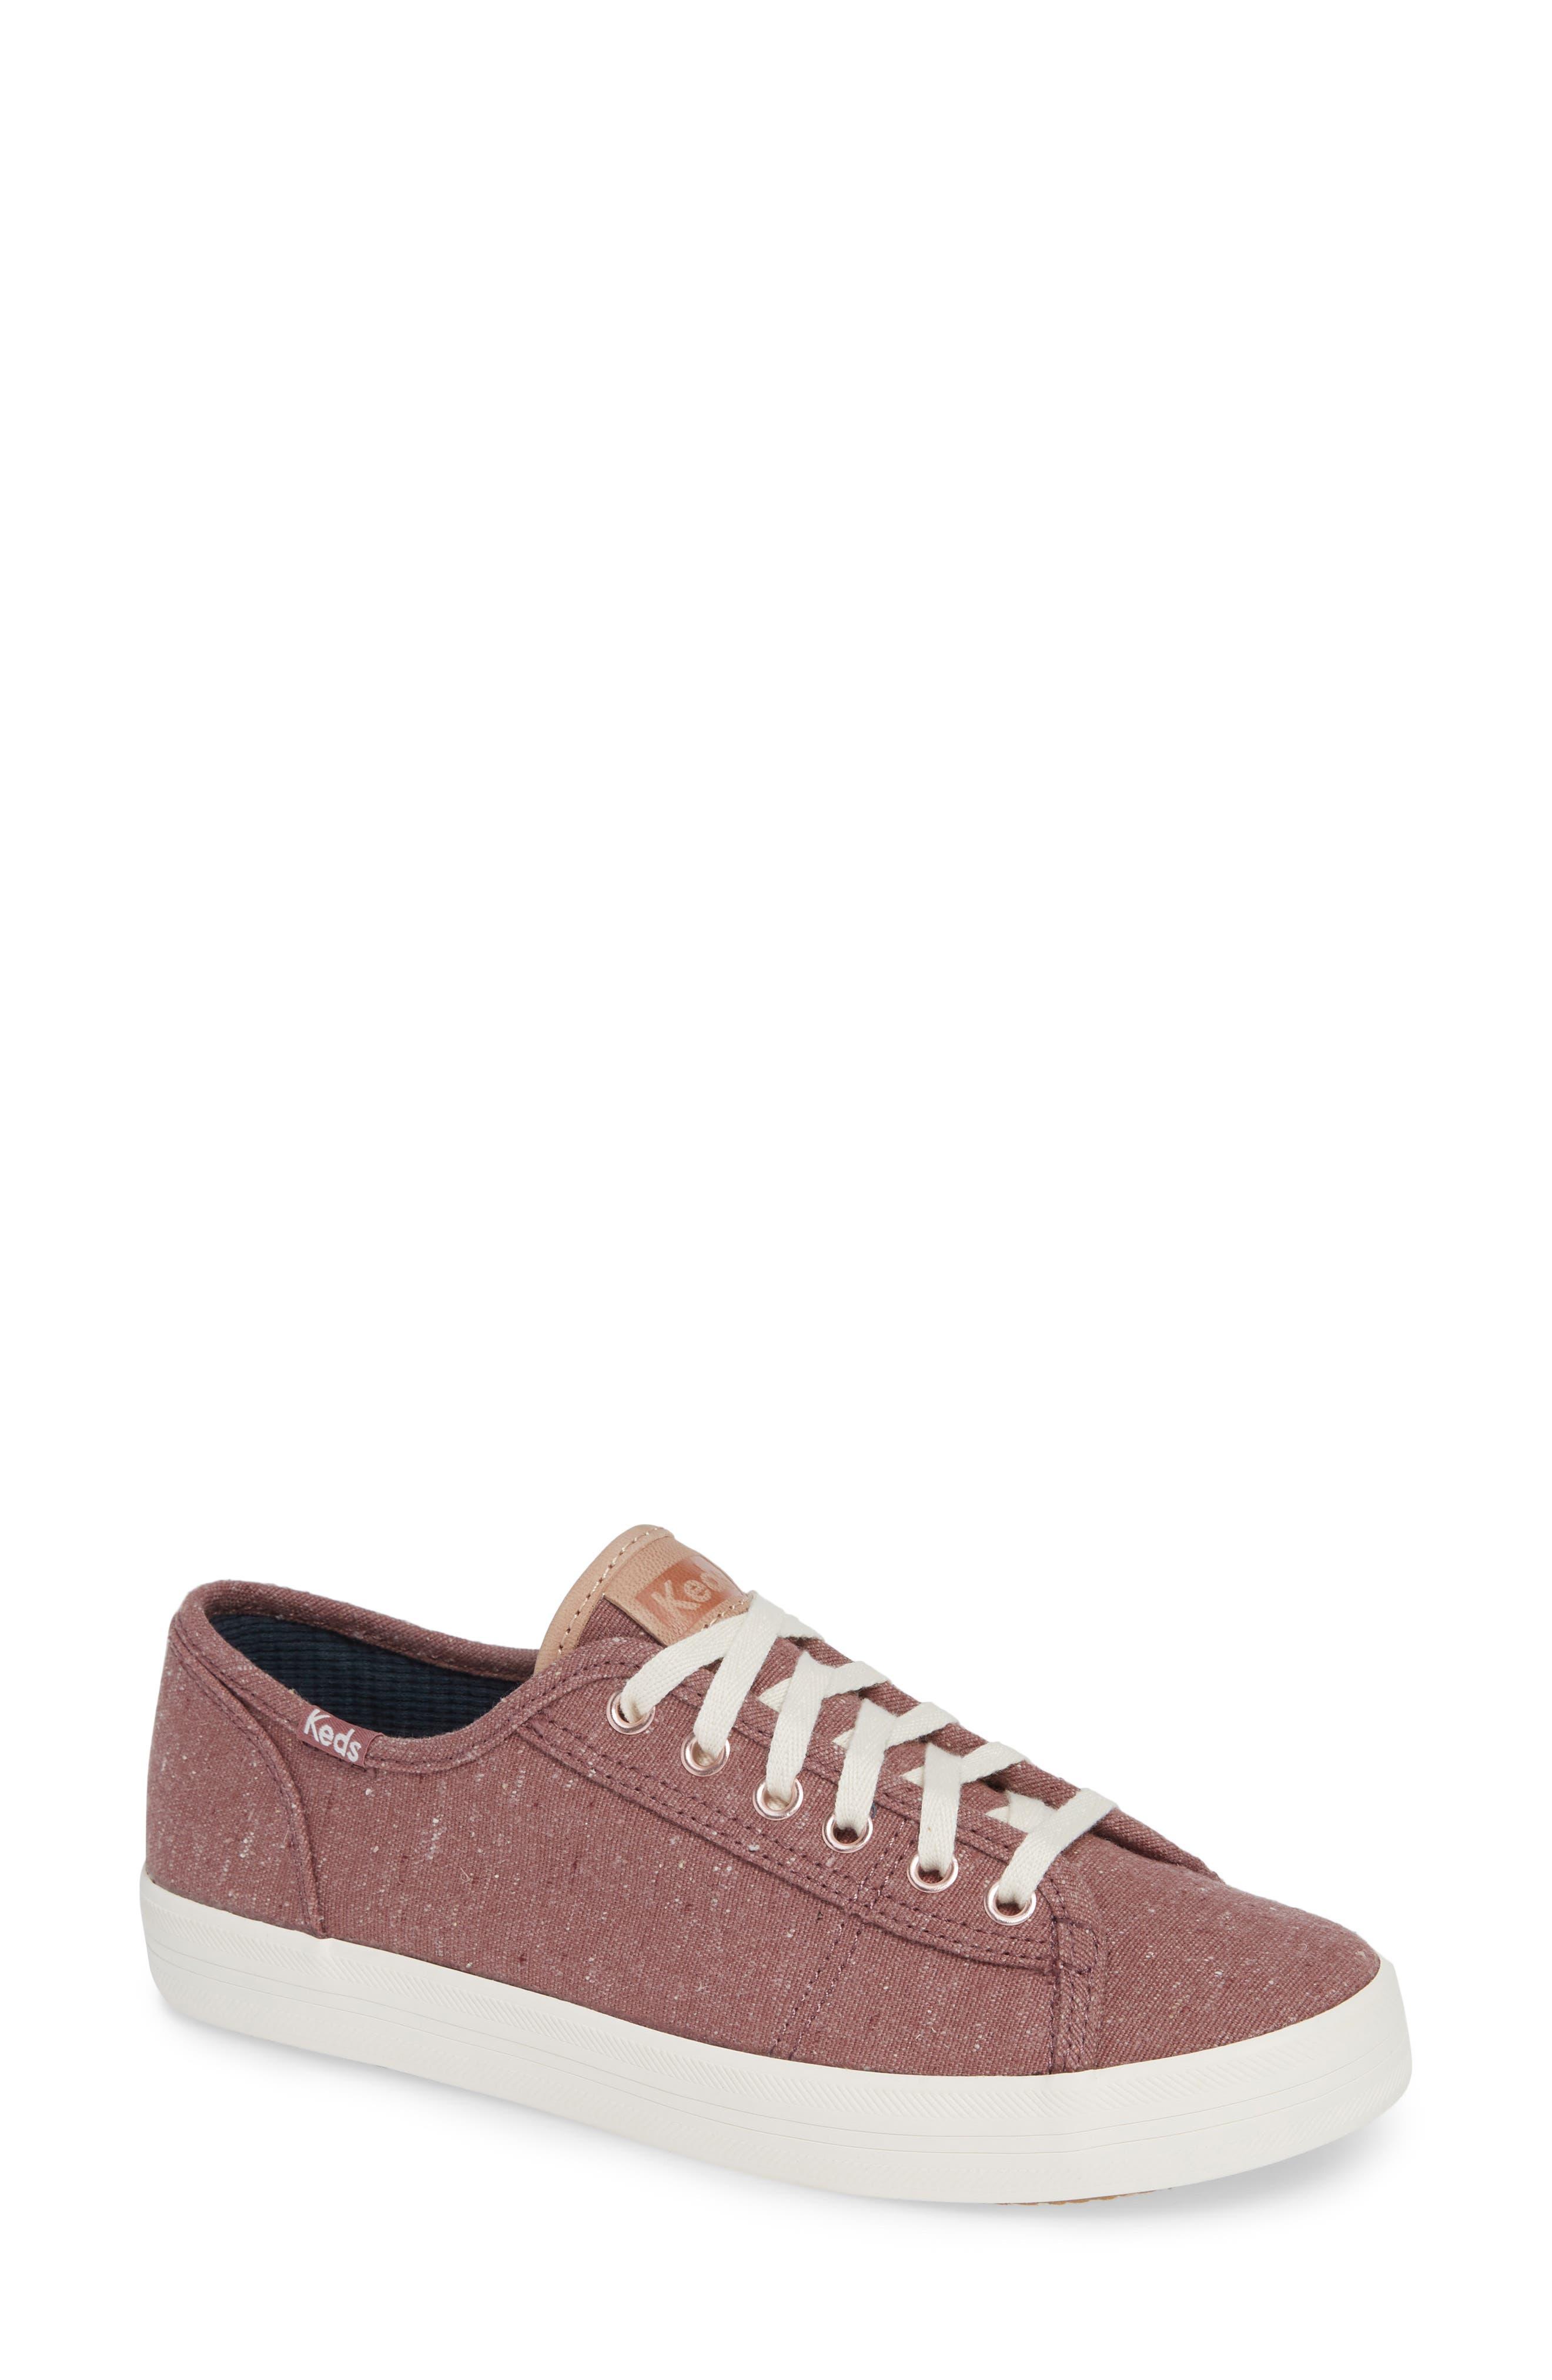 KEDS<SUP>®</SUP> Kickstart Sneaker, Main, color, MAUVE